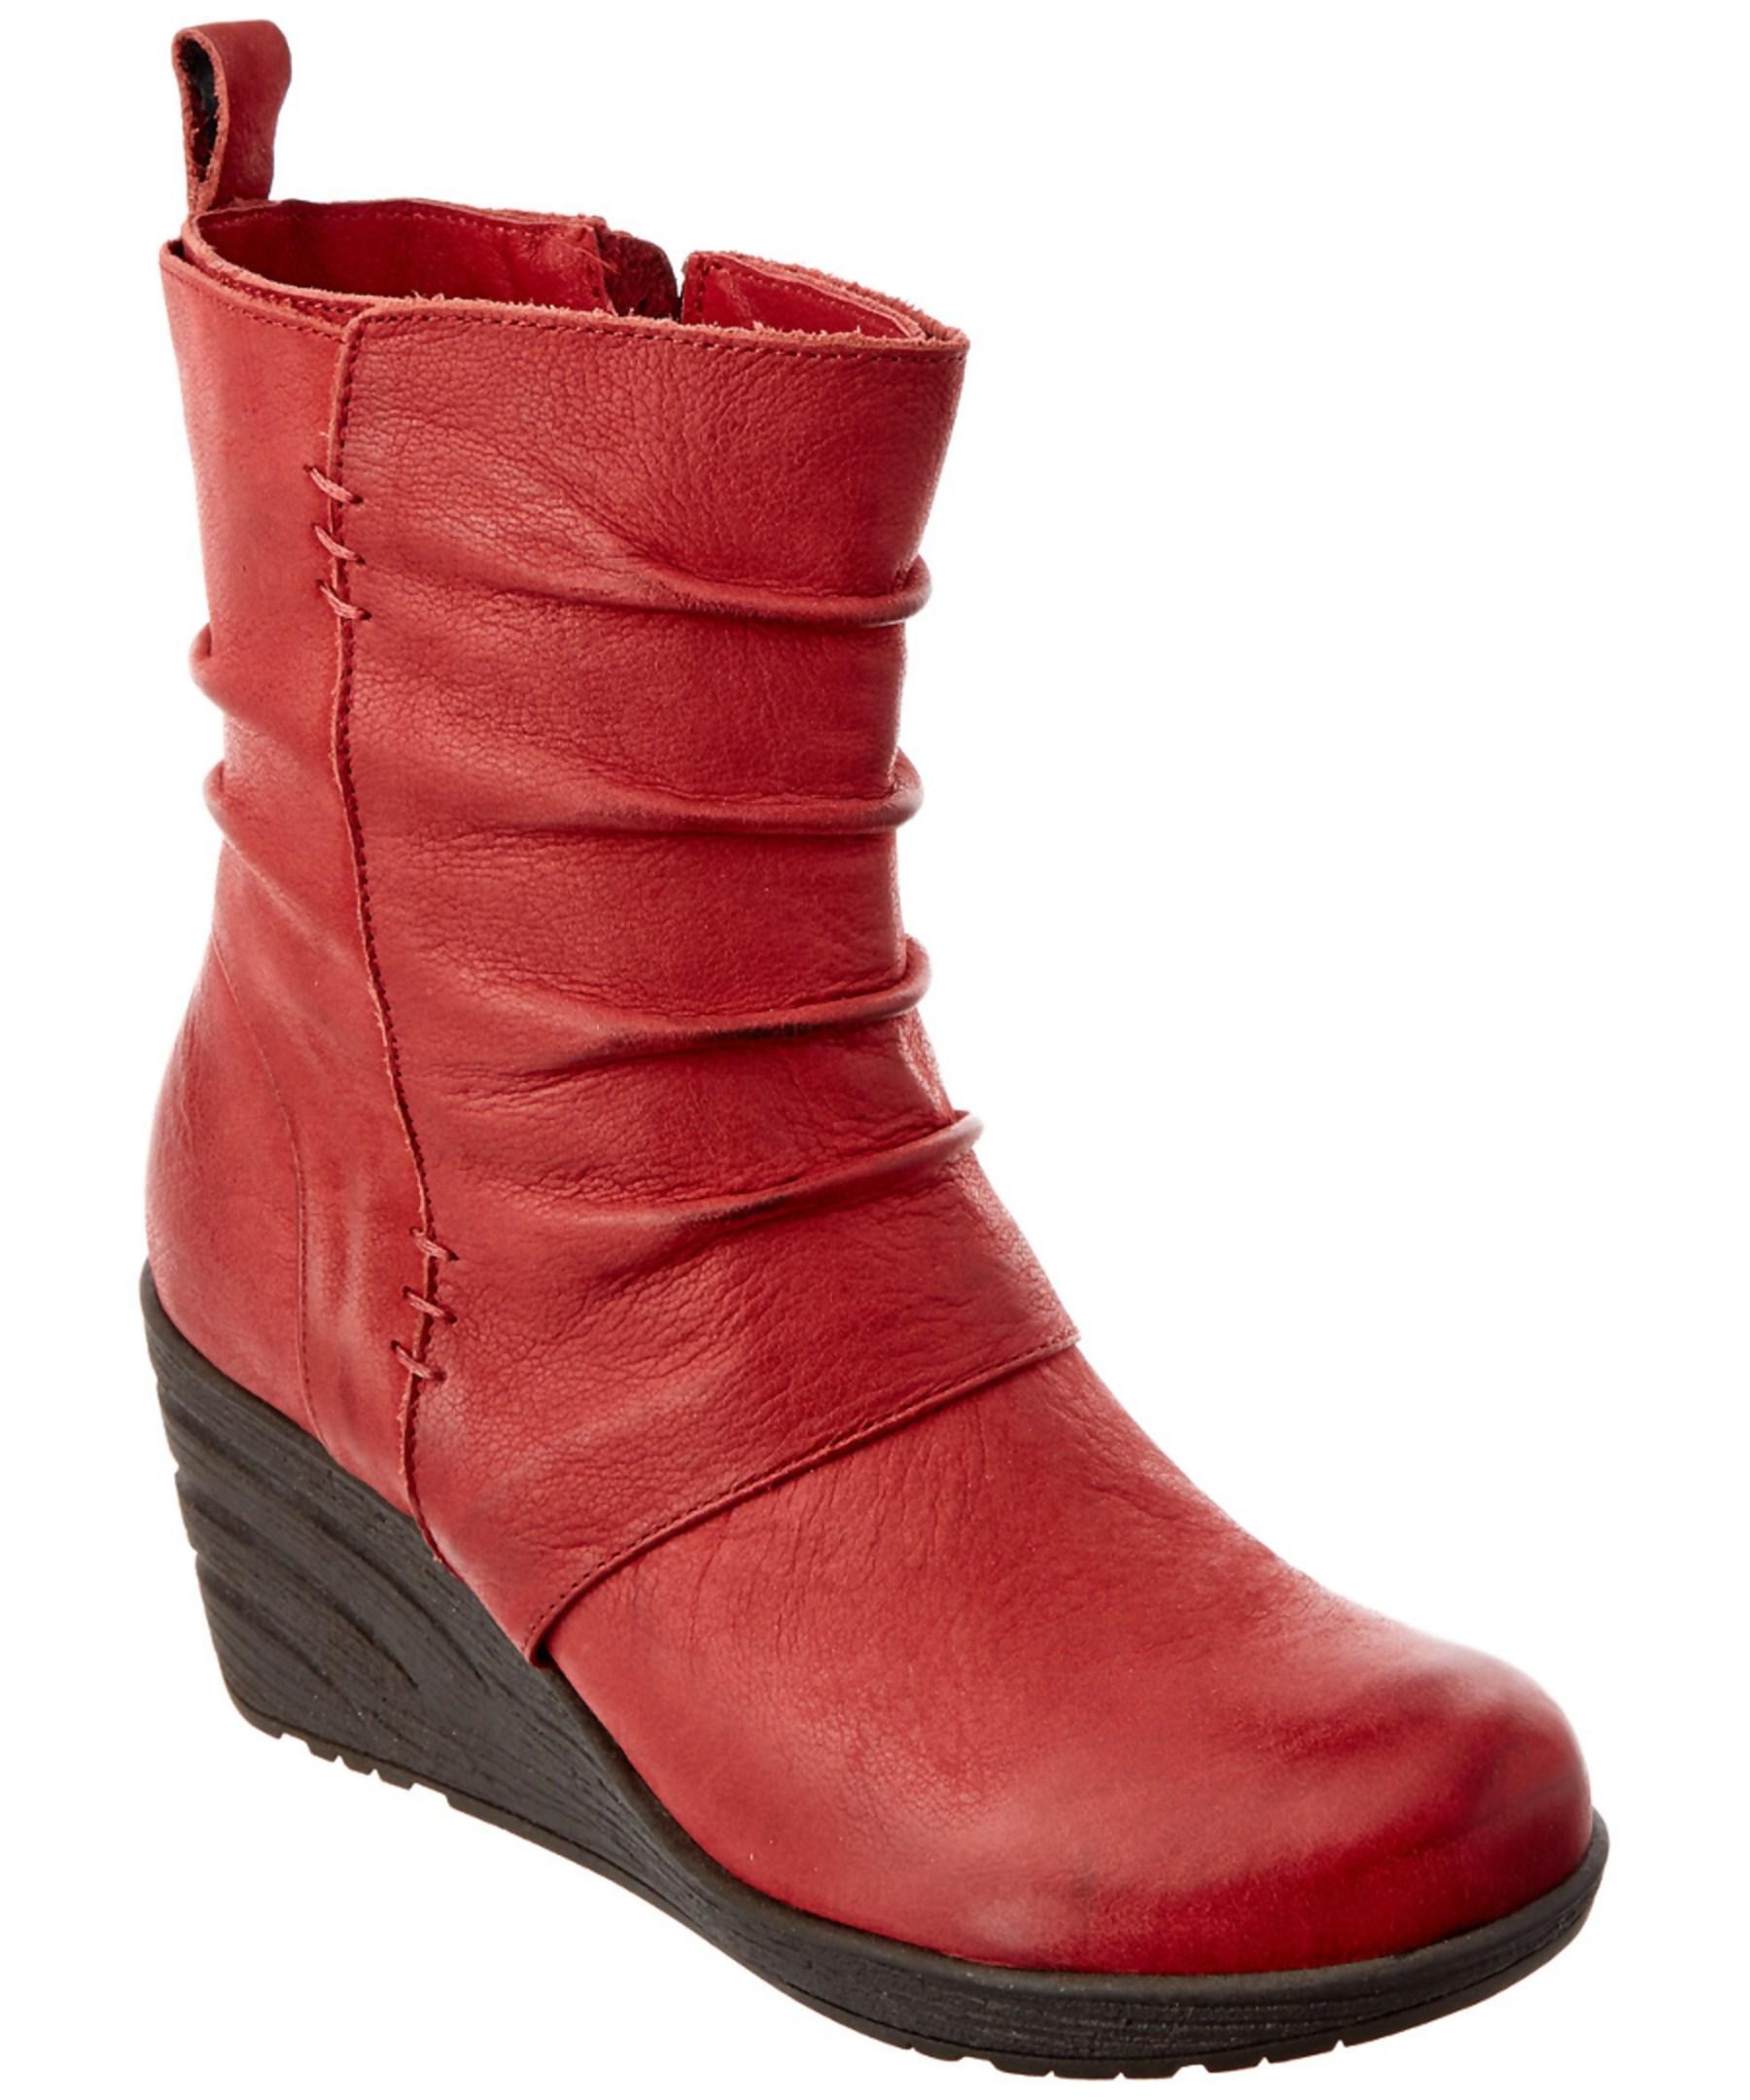 Miz Mooz Shoes Red